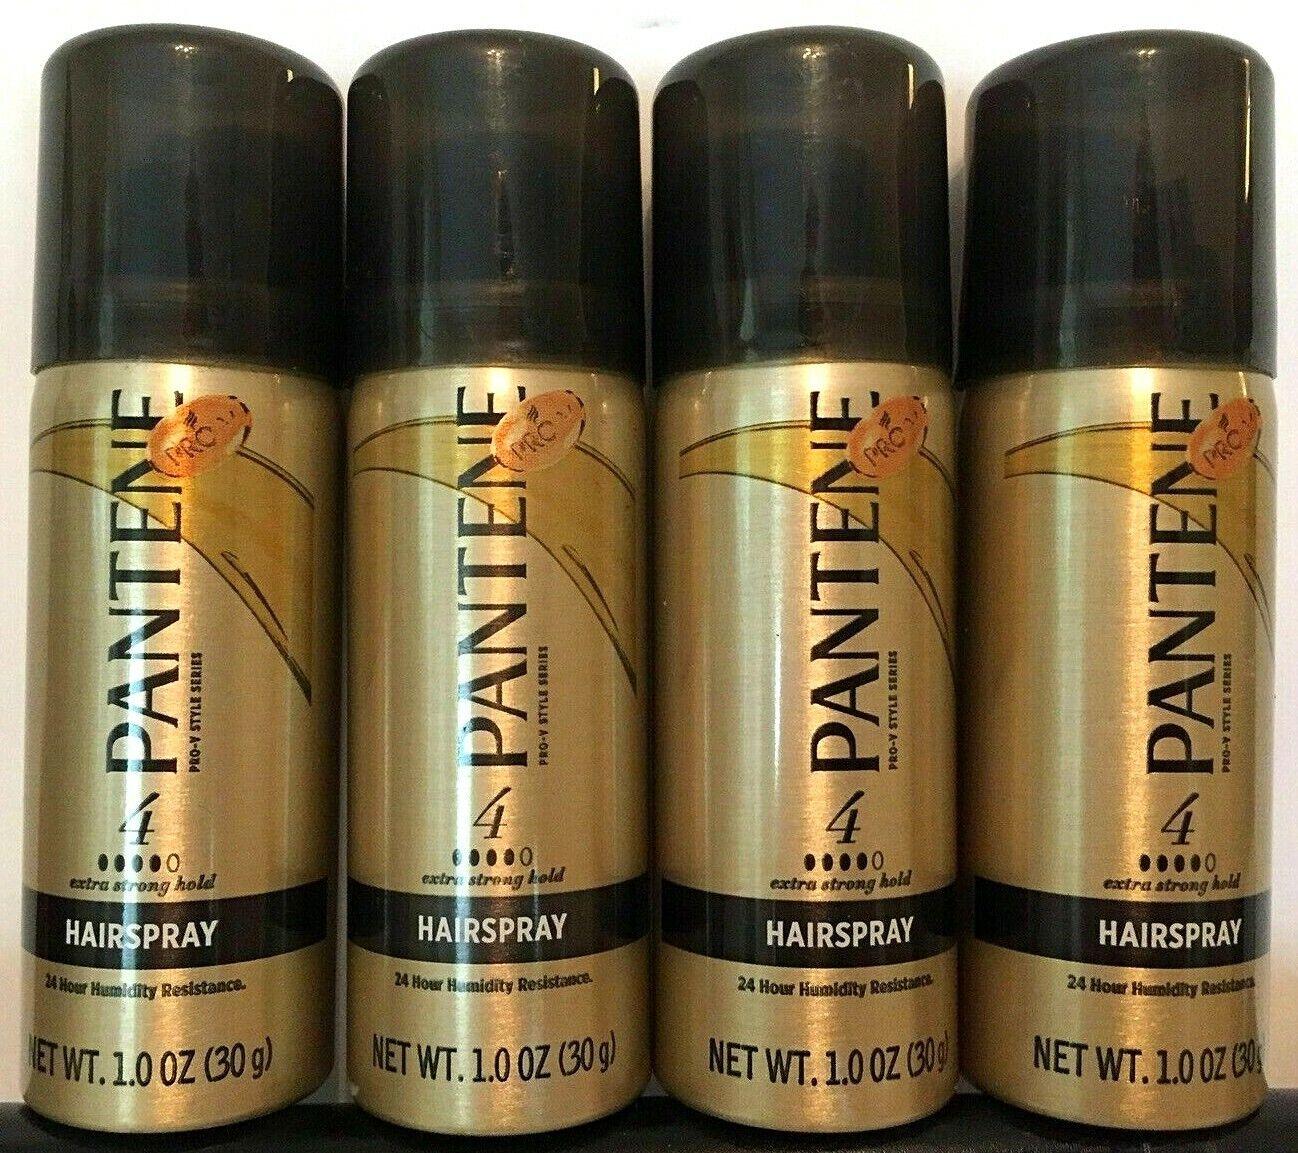 Pantene Pro-V Extra Strong Hold Hair Spray 1 oz